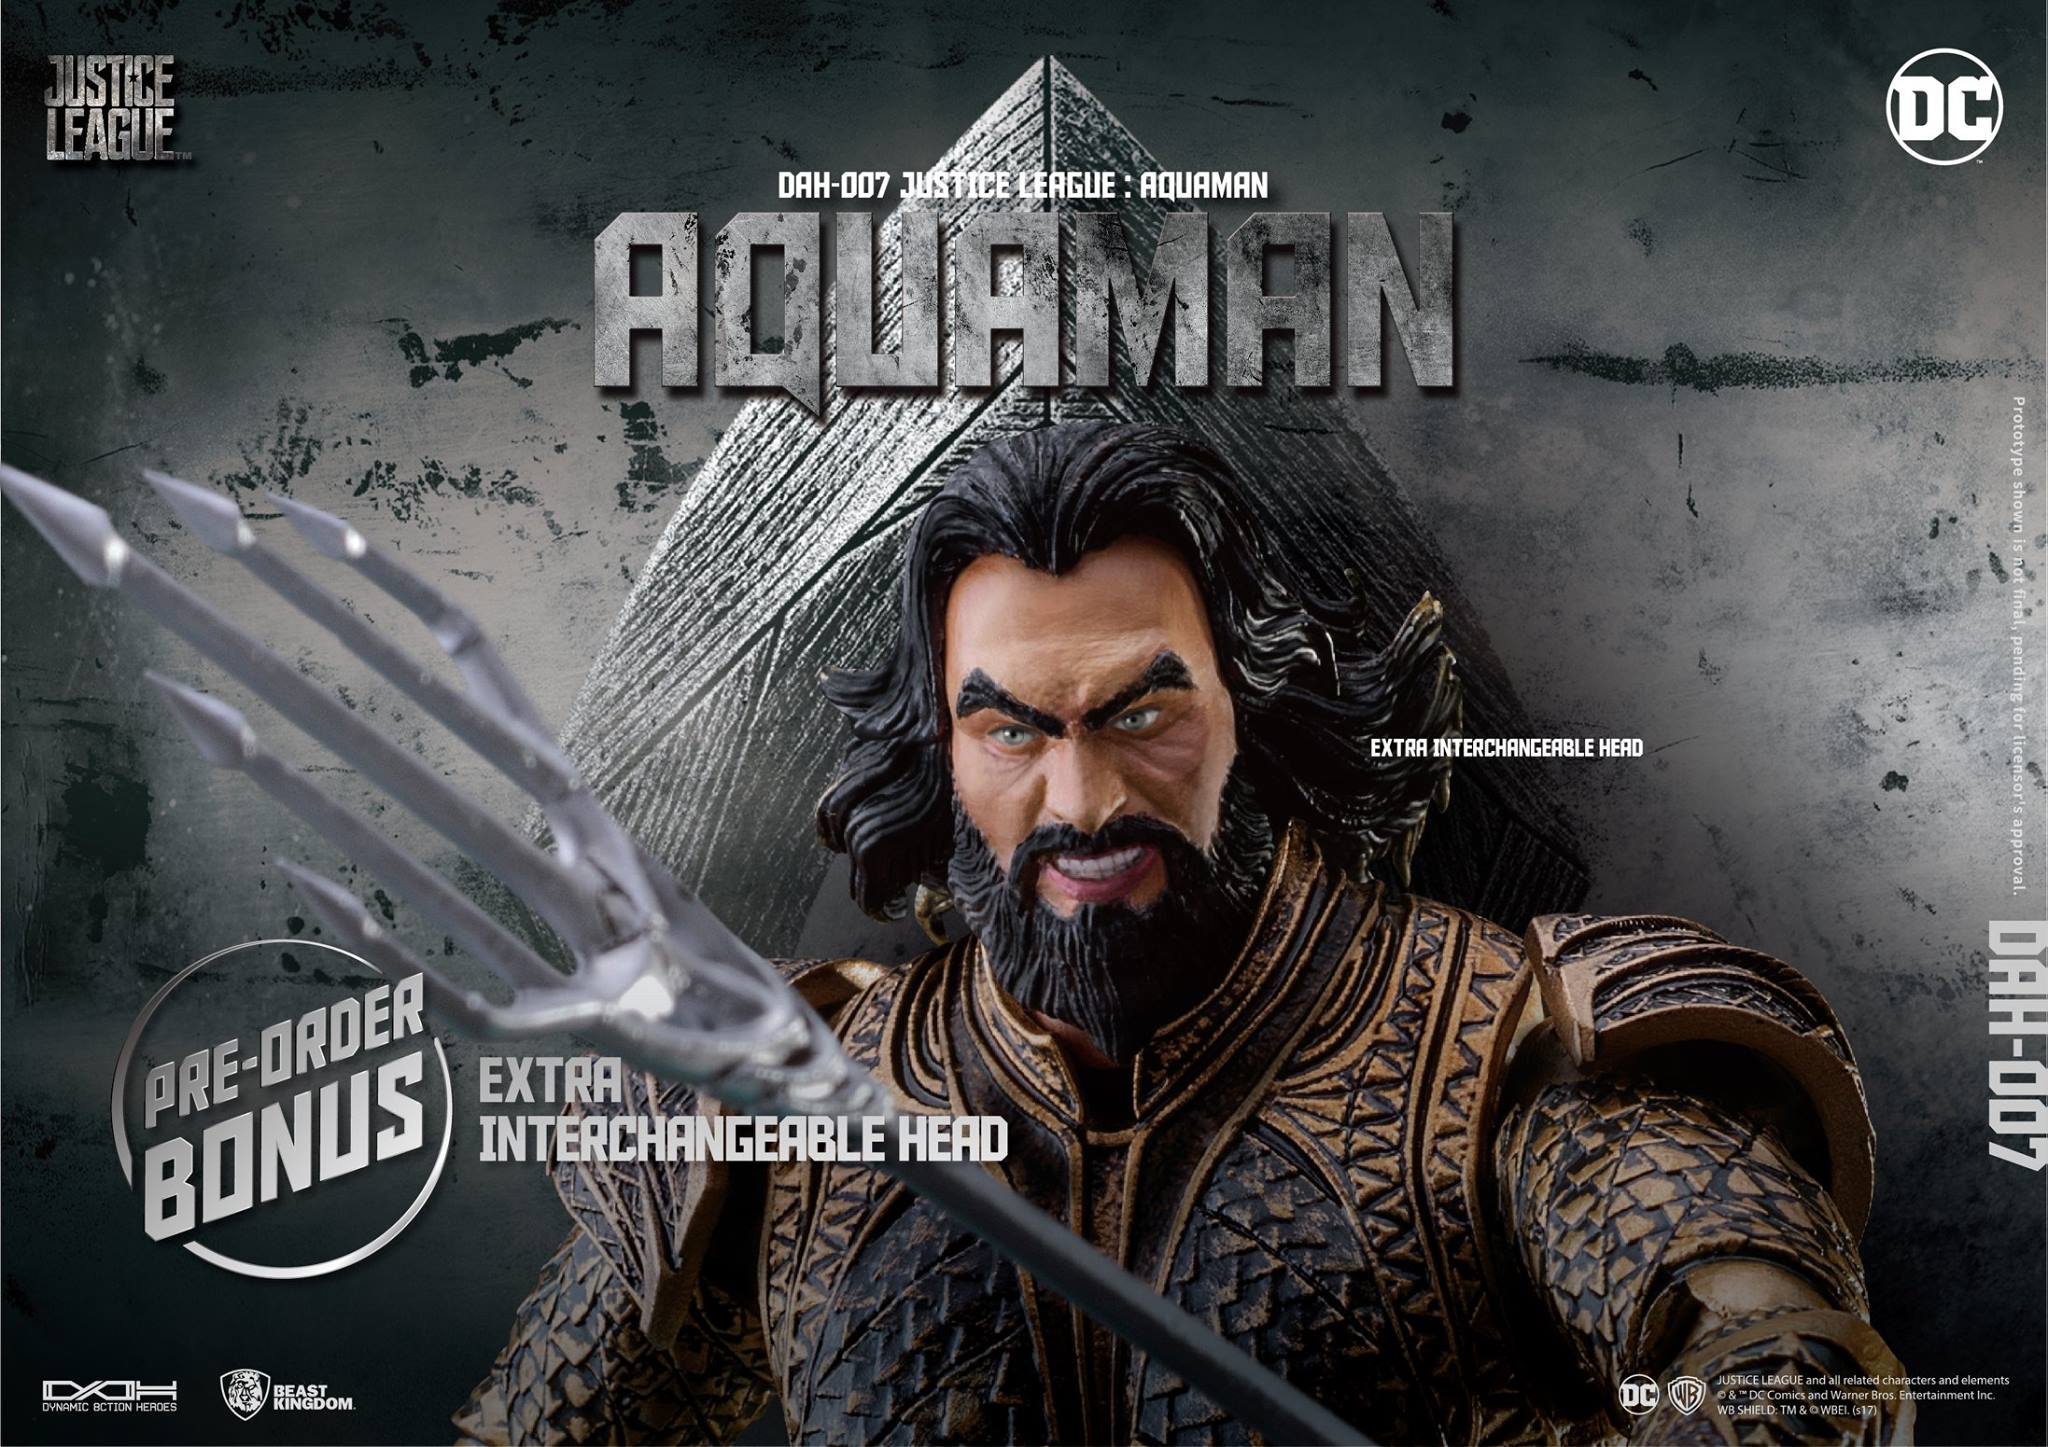 DAH-Justice-League-Aquaman-004